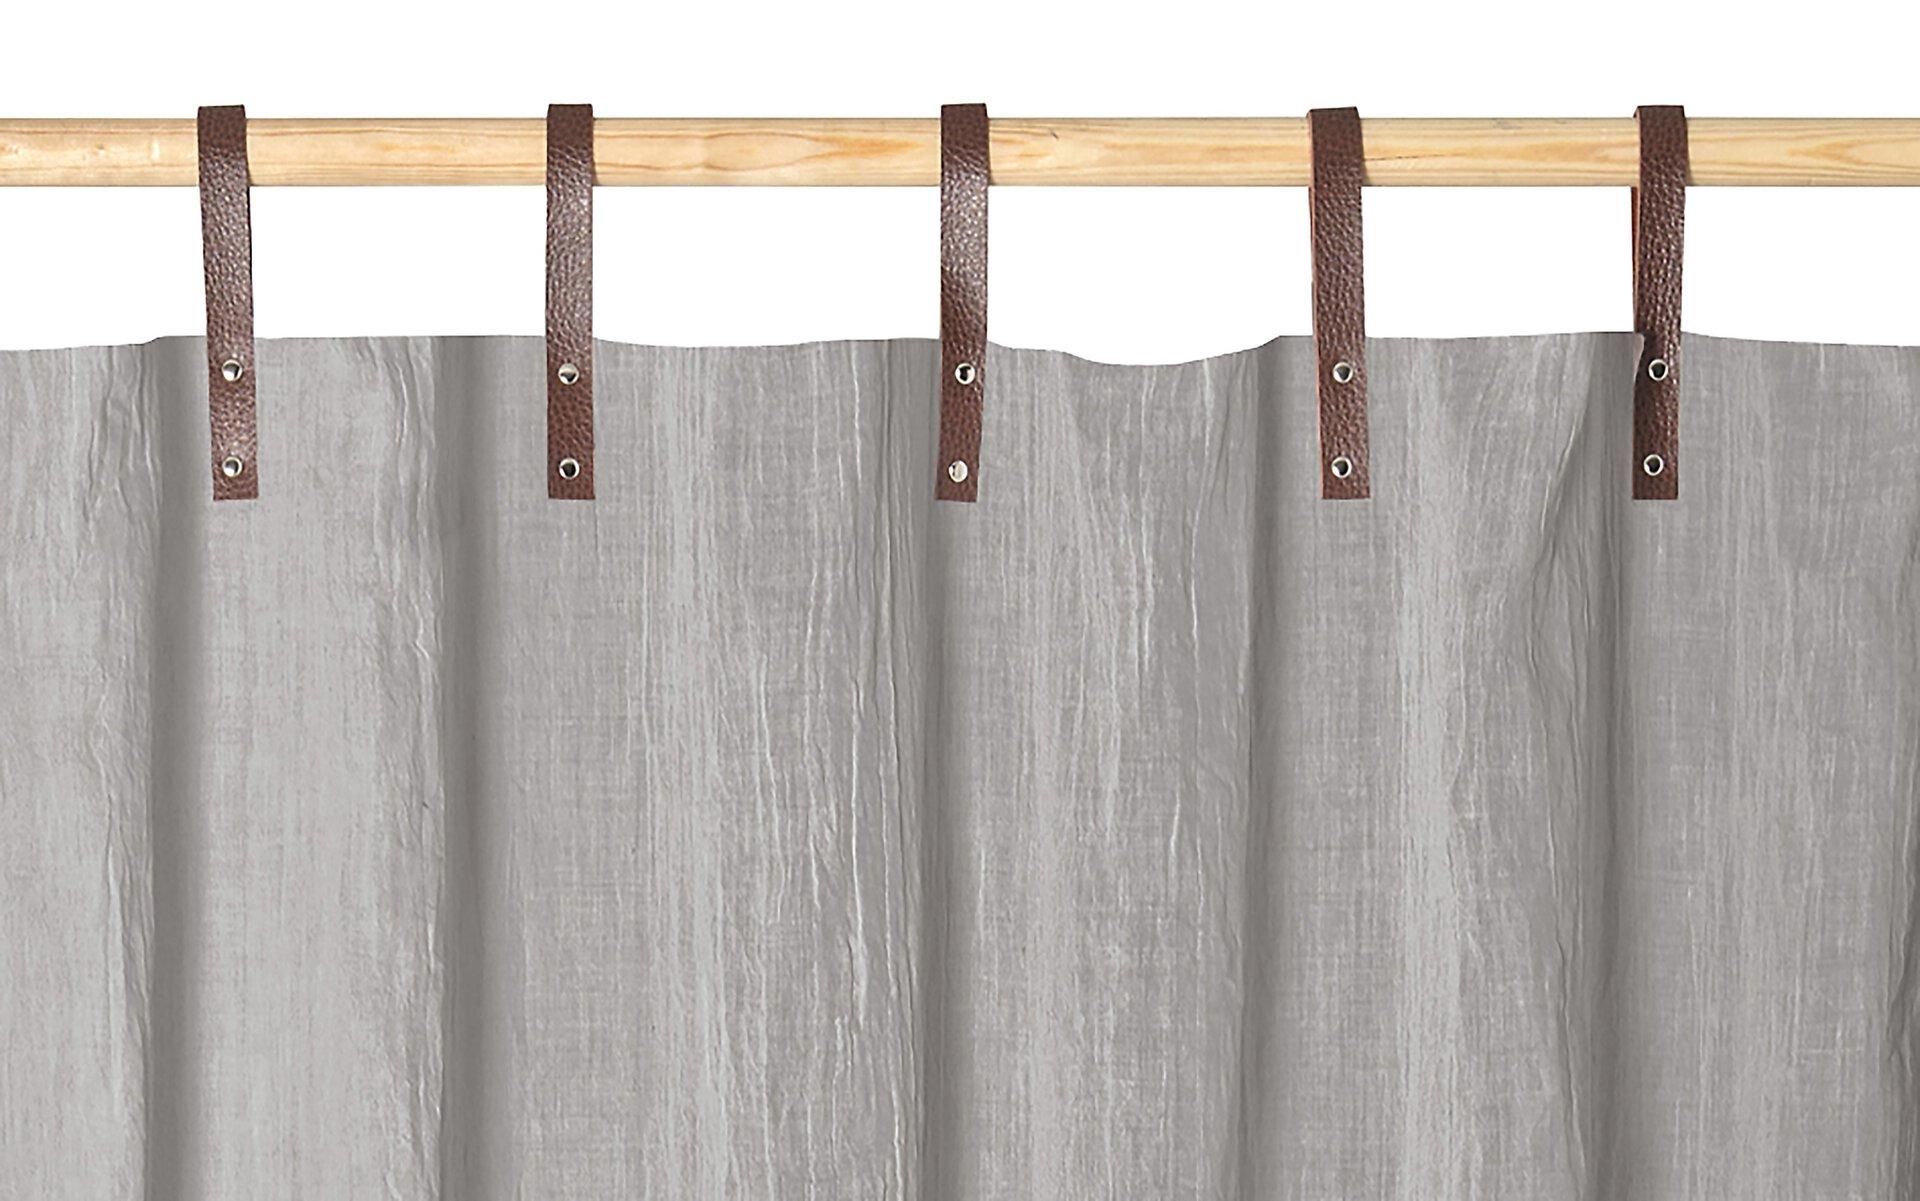 Schlaufenschal Evi Magma Textil silber 135 x 245 cm